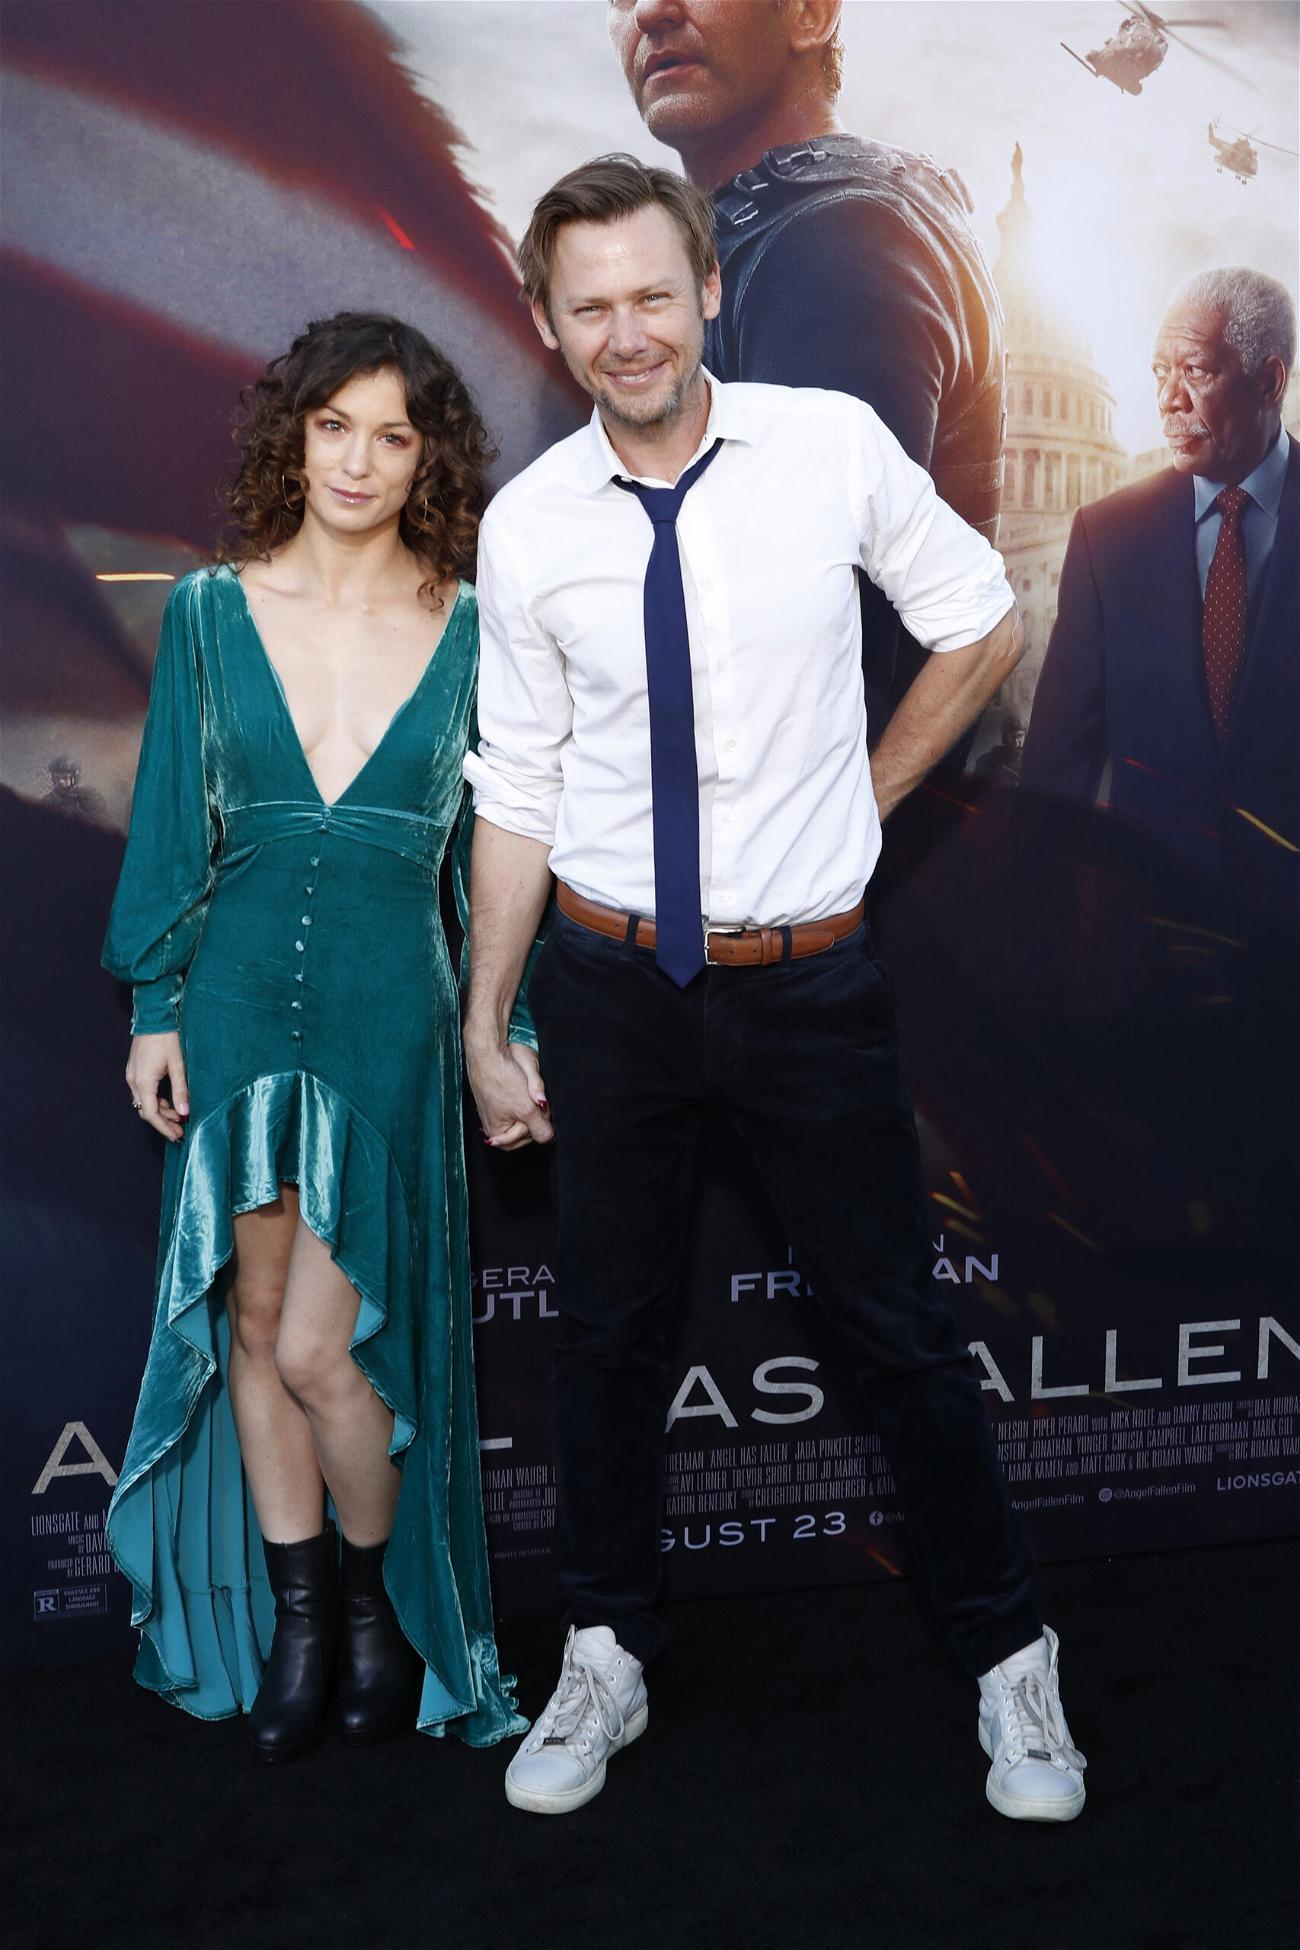 'Westworld' Star Jimmi Simpson Files For Divorce